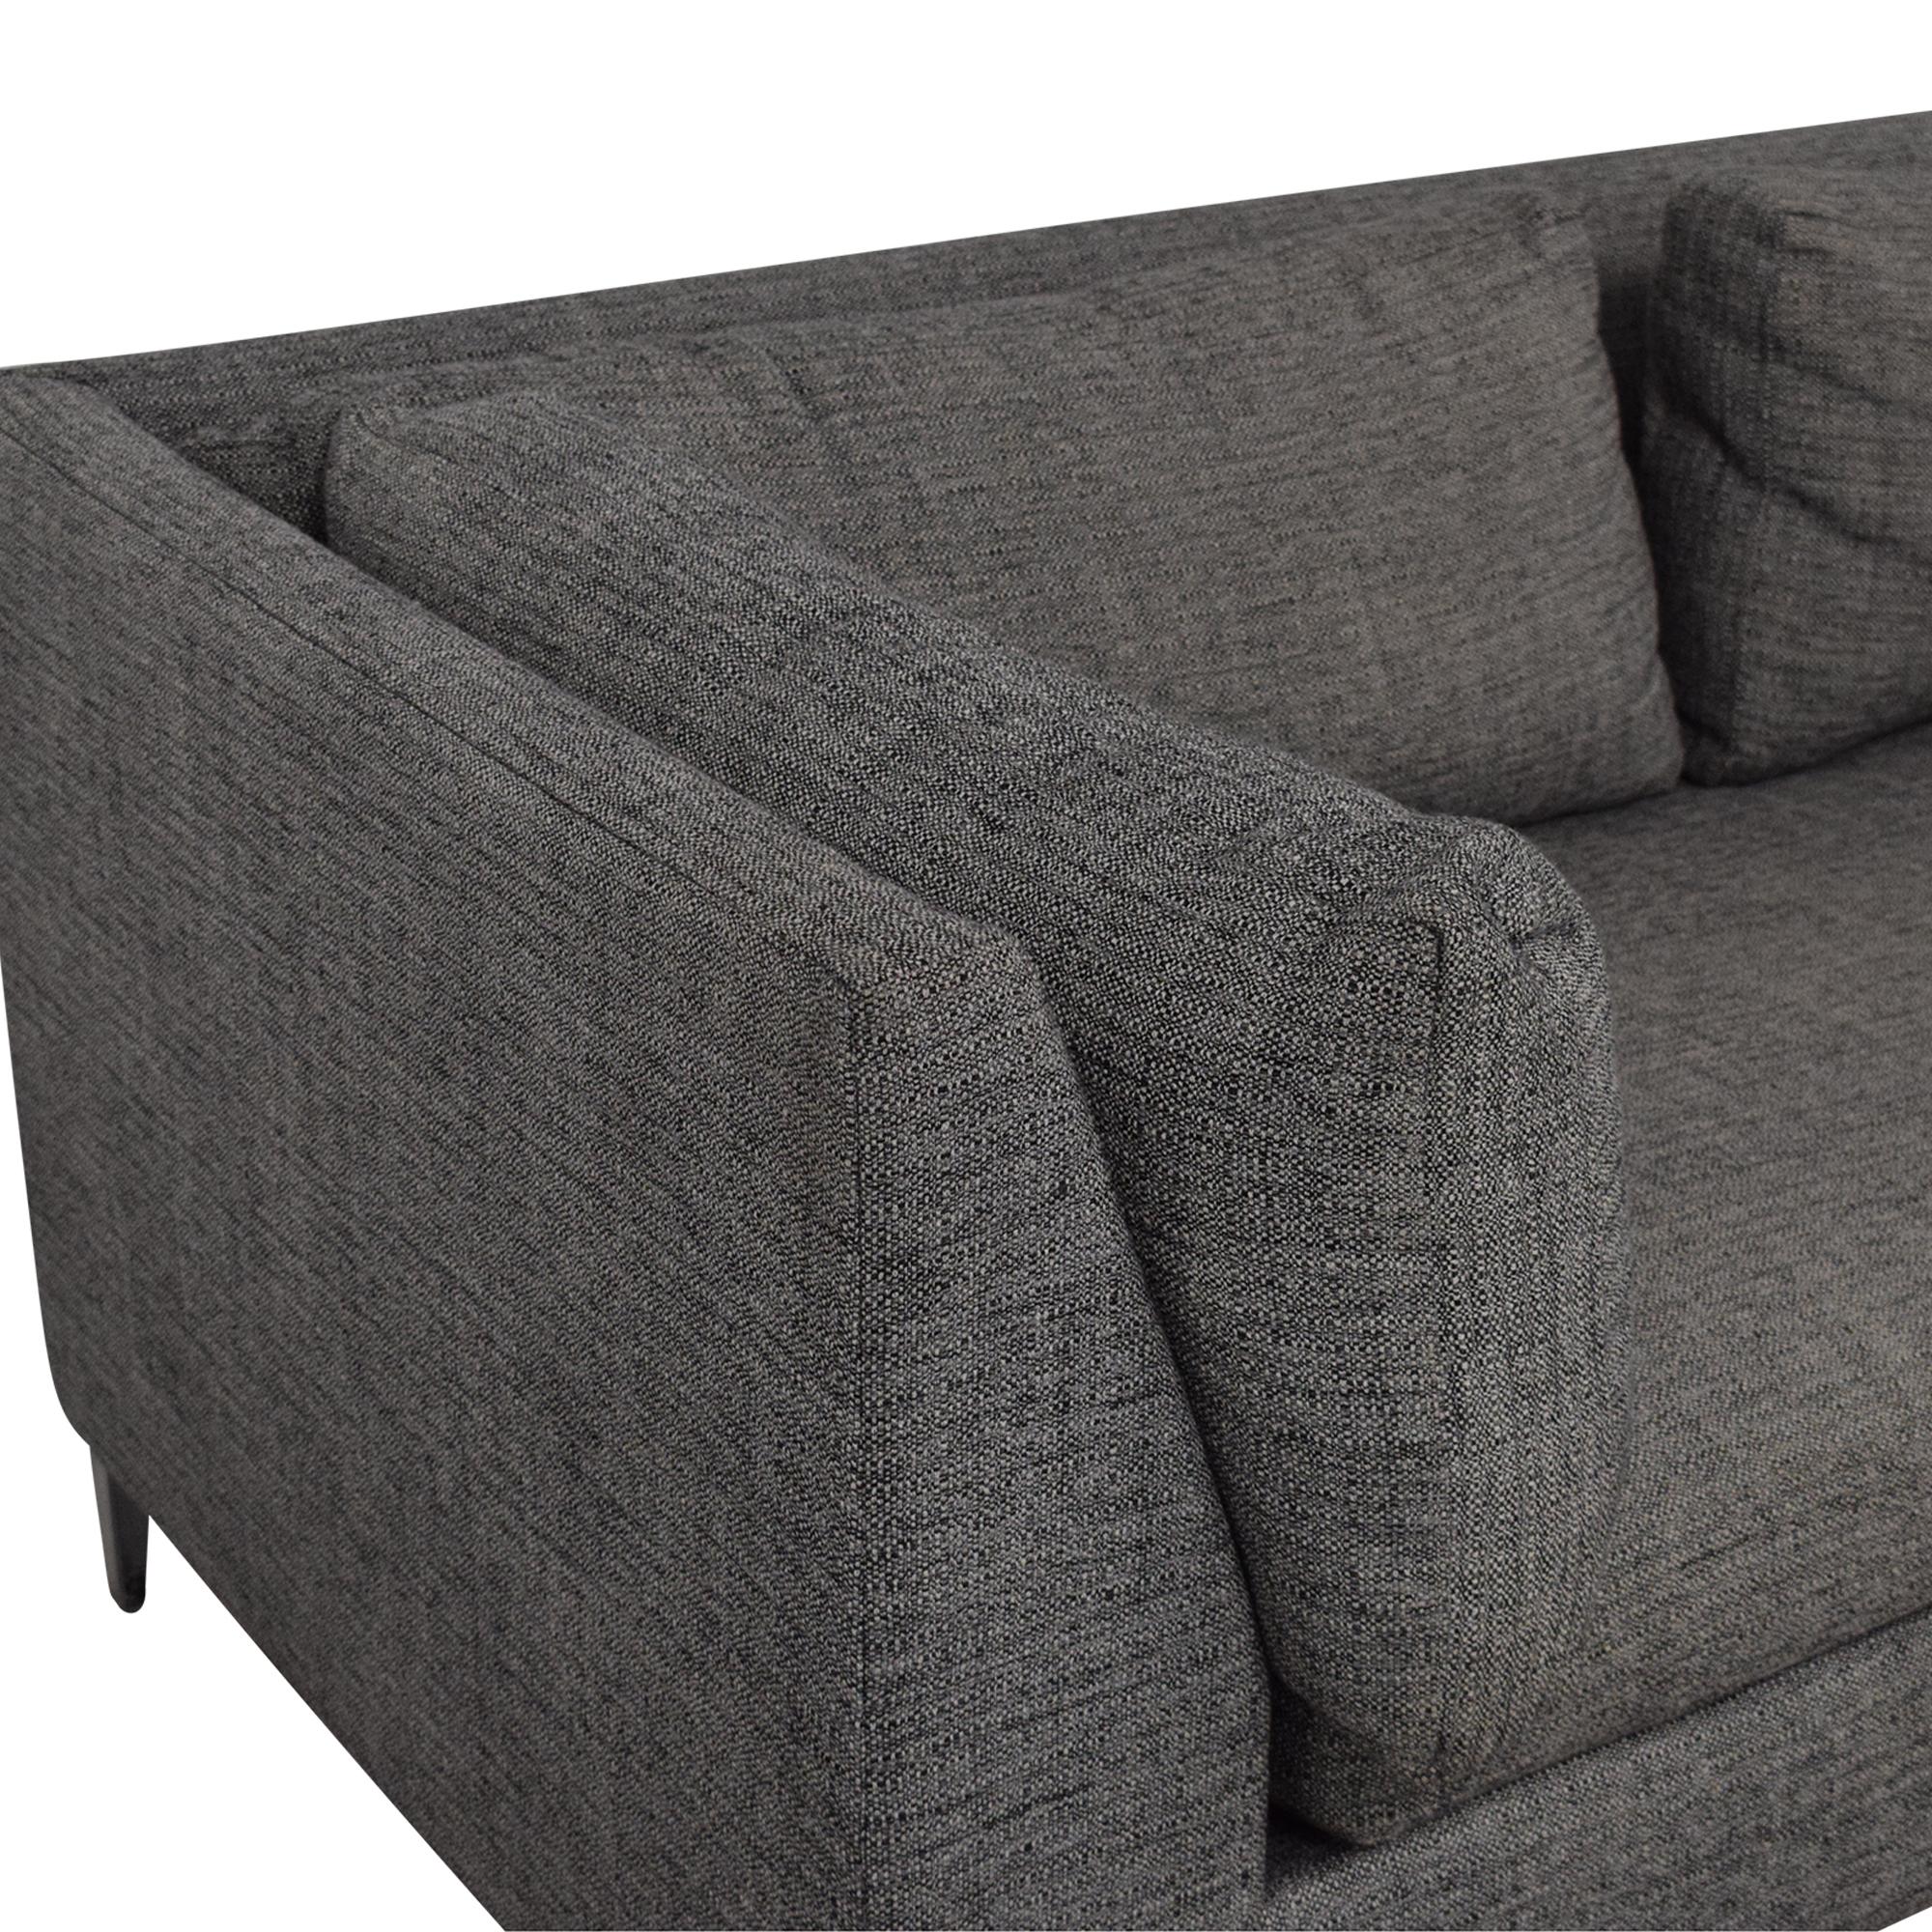 CB2 Decker Two- Piece Sectional Sofa sale